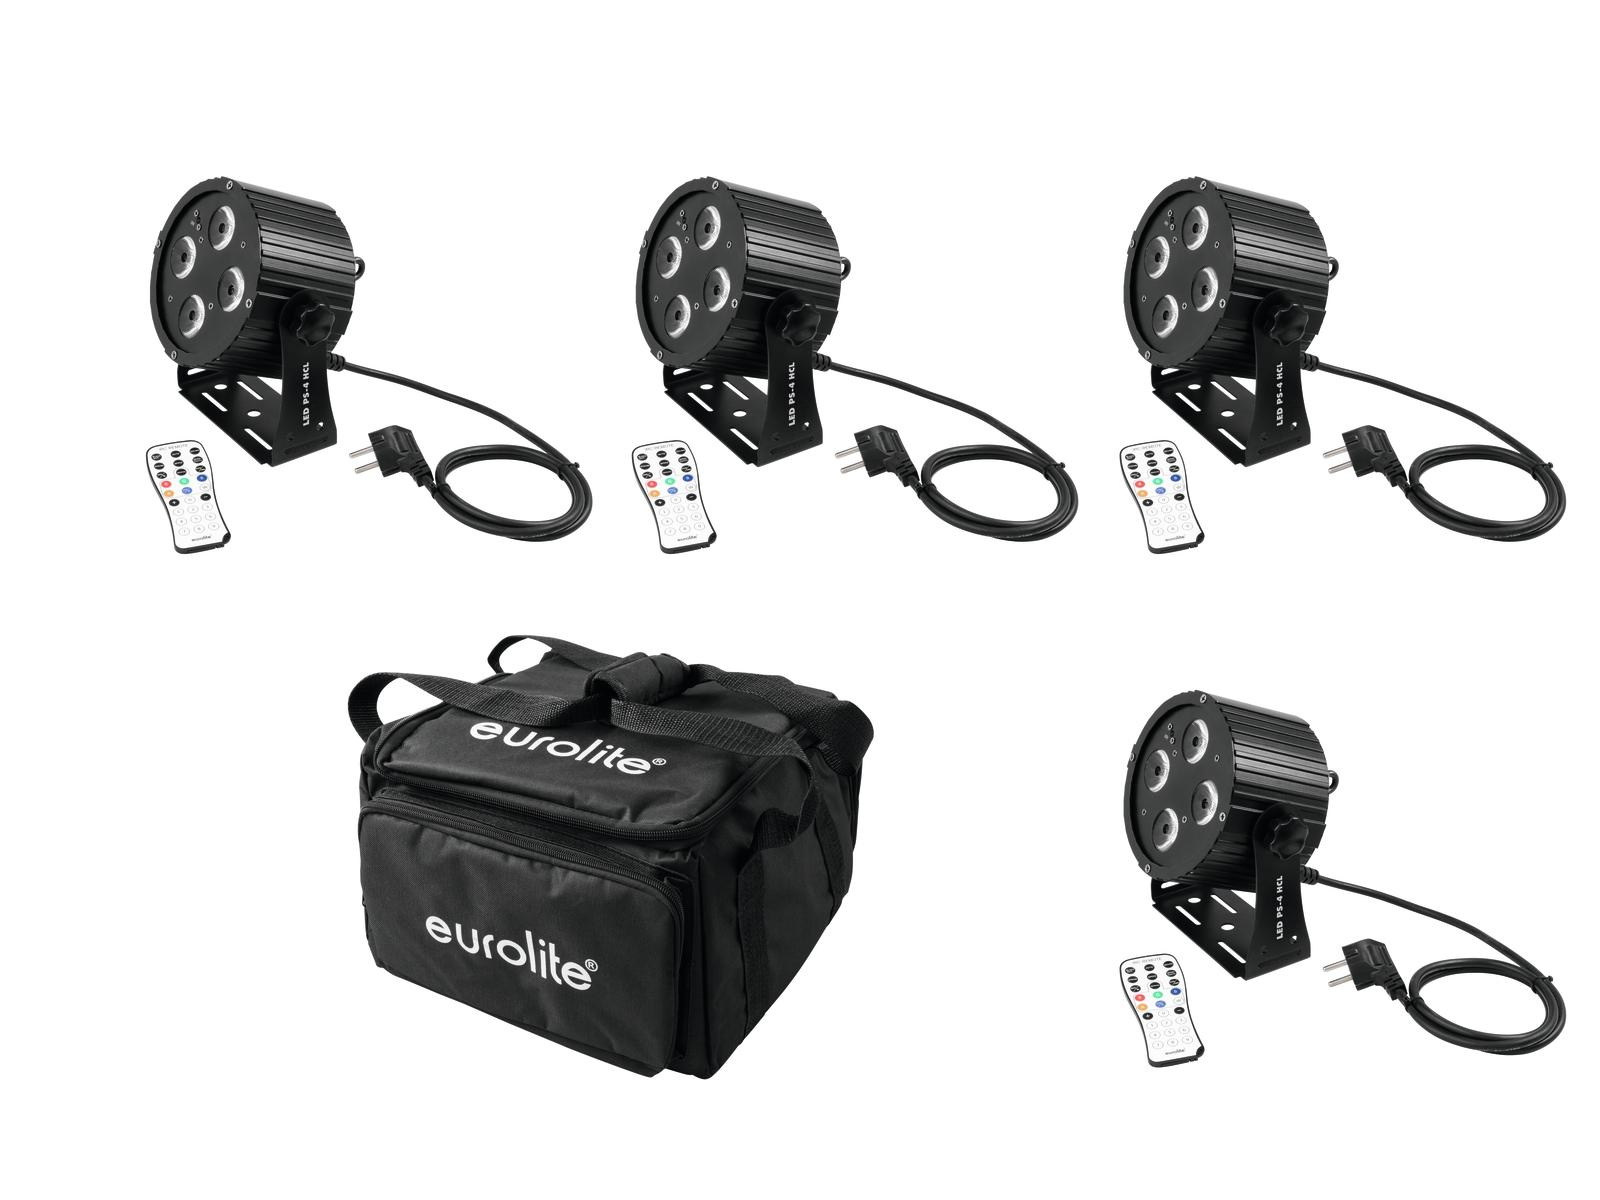 EUROLITE Set 4x LED PS-4 HCL S